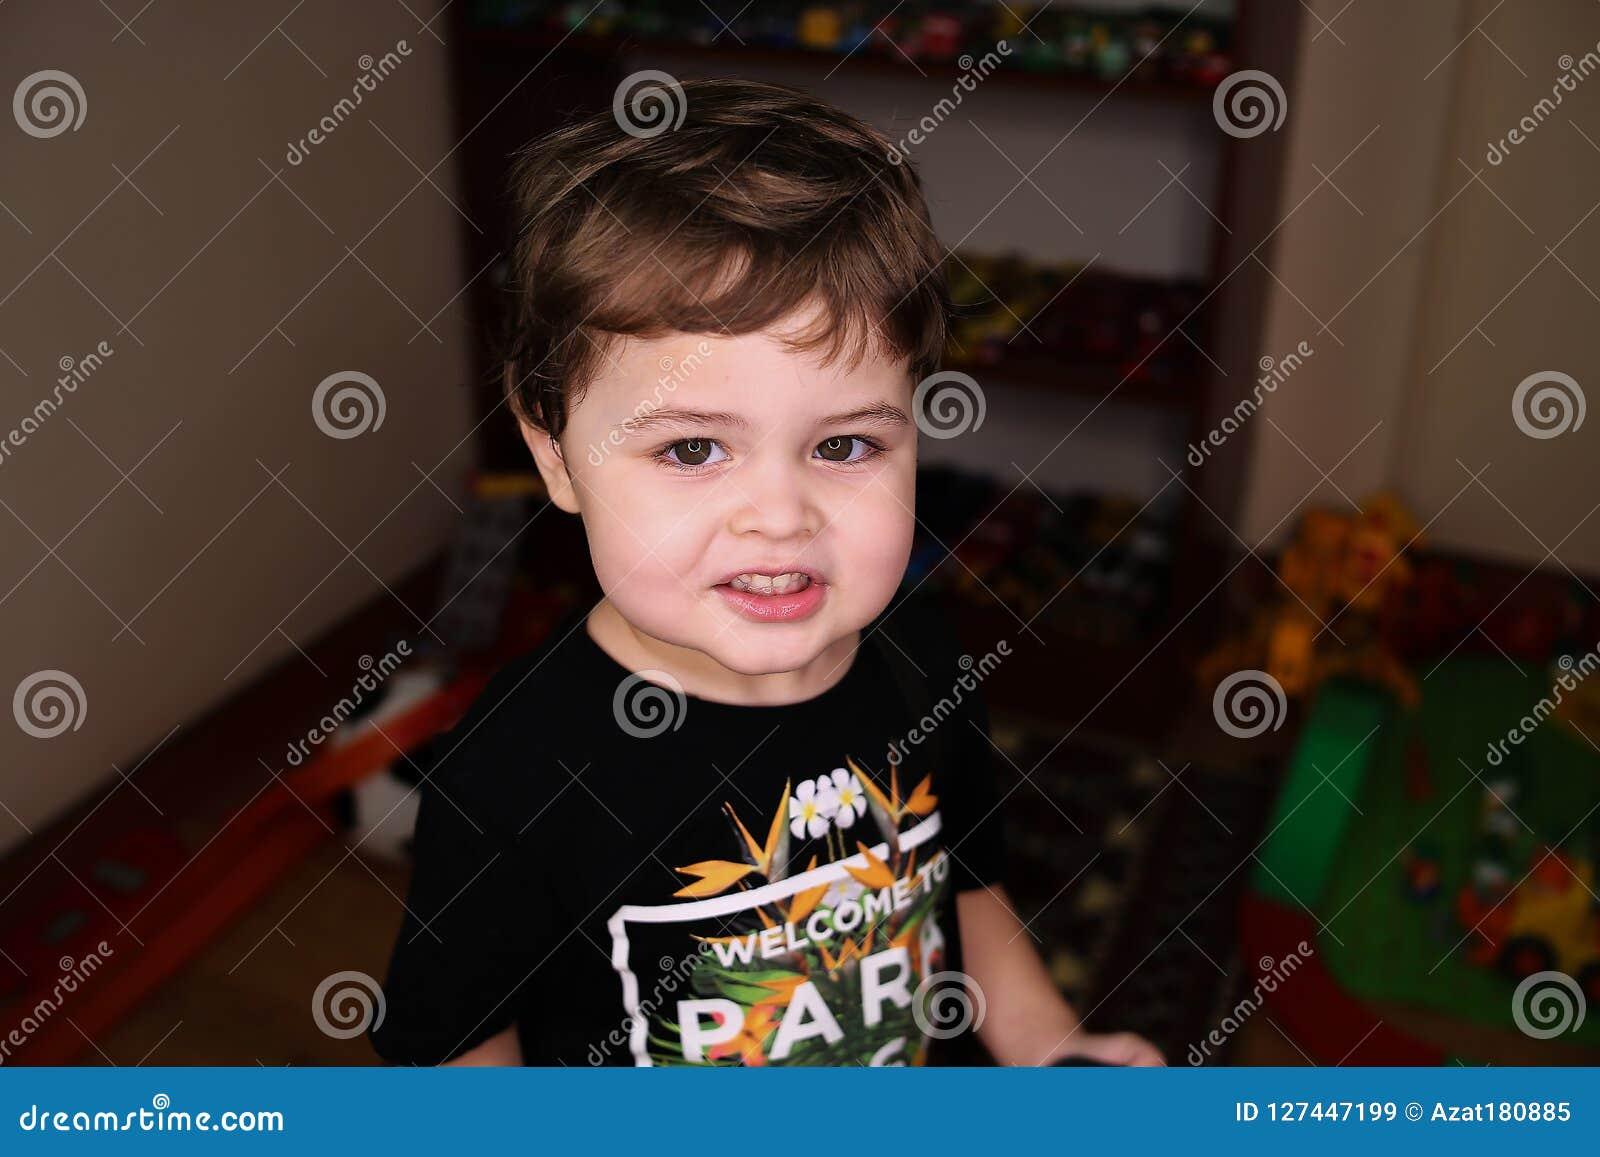 Little cute boy in black t-shirt smiling.